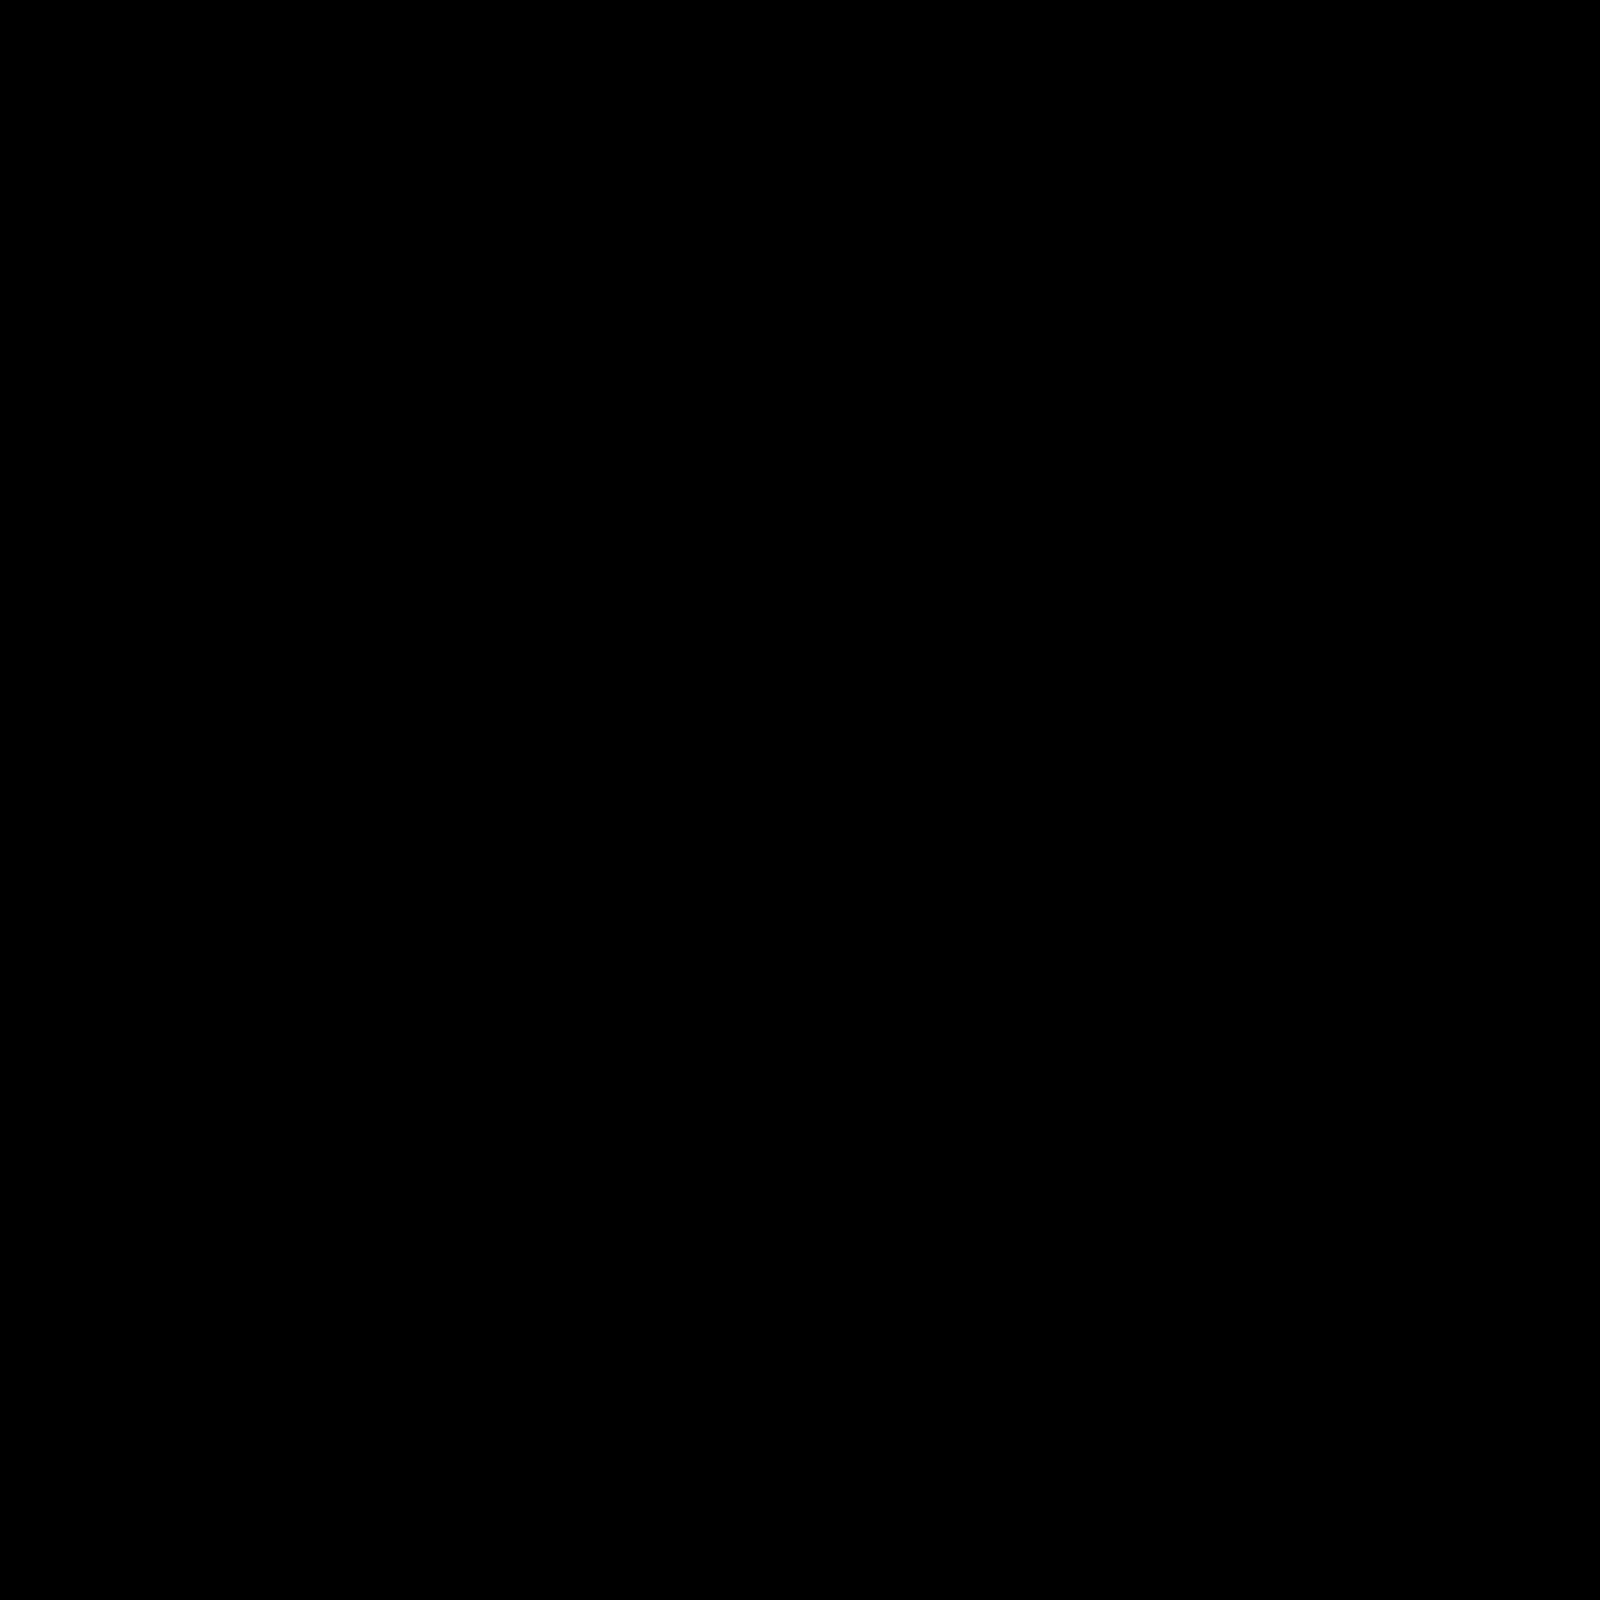 Empty Dog Bowl icon